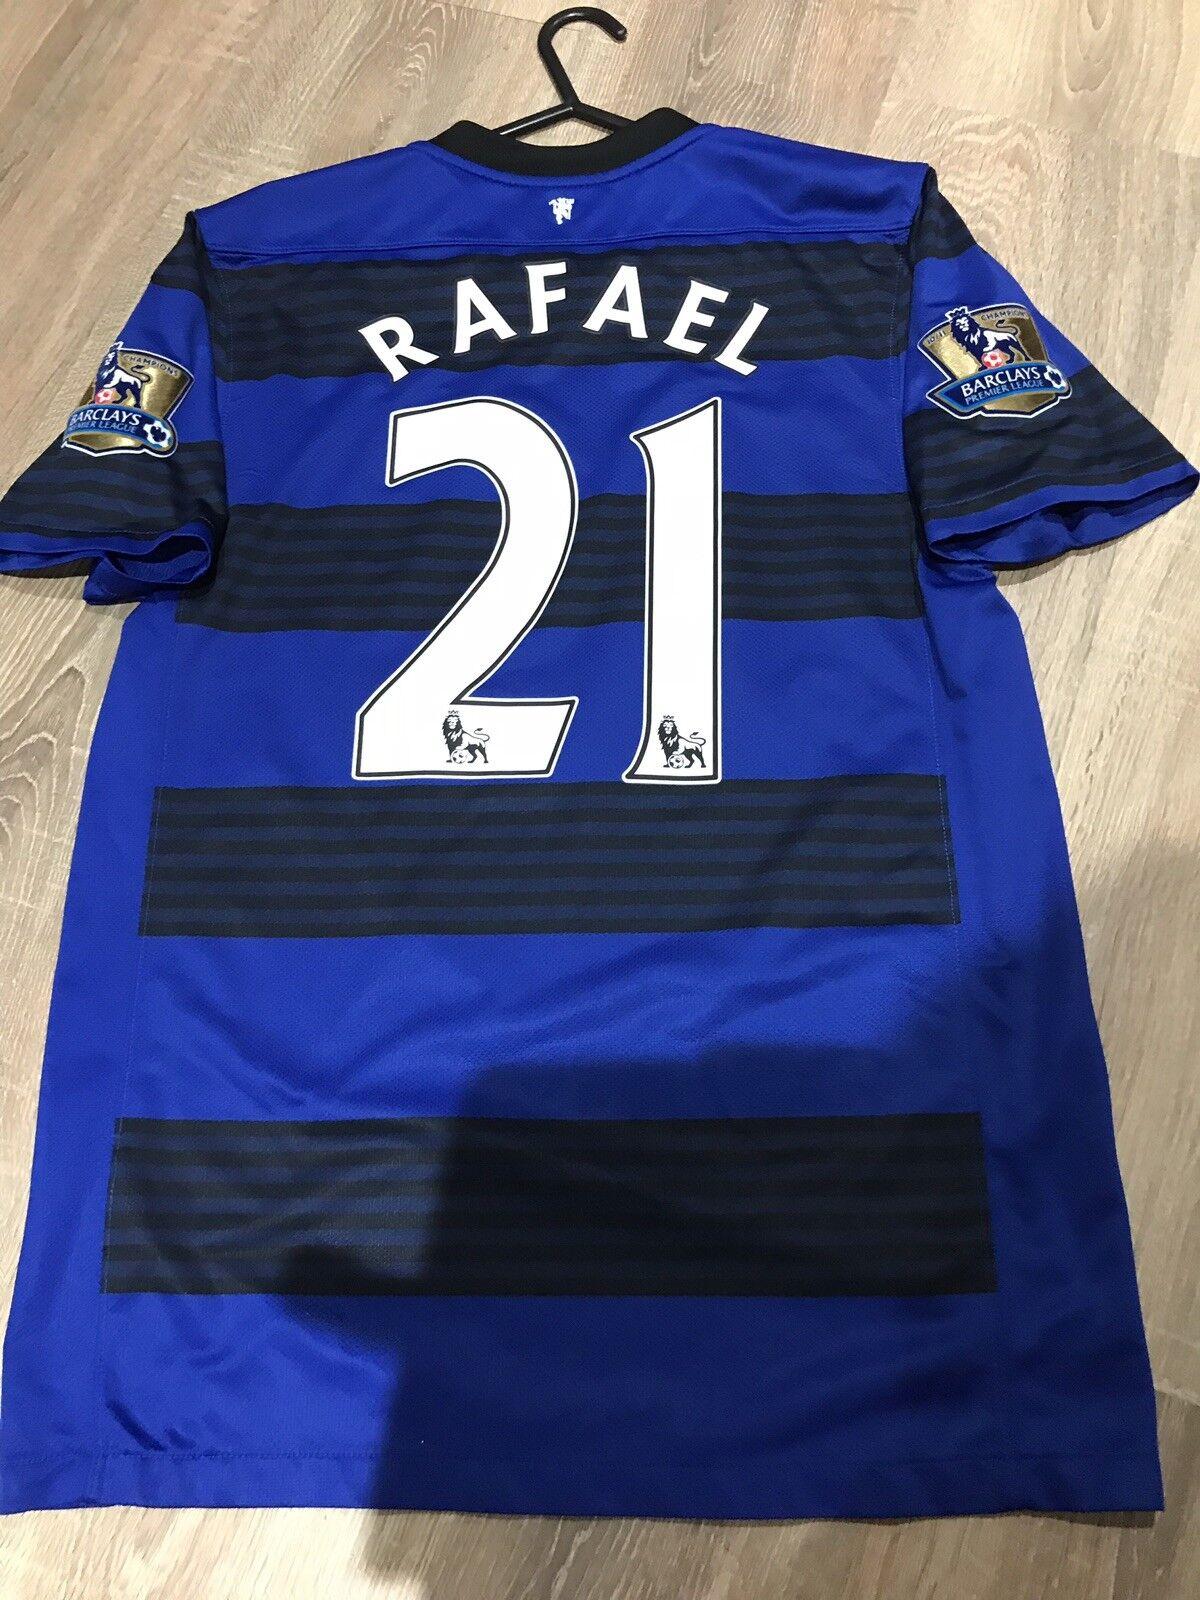 Manchester United United United 2011 12 Away Camicia Adulti (S) 21 Rafael 932a80